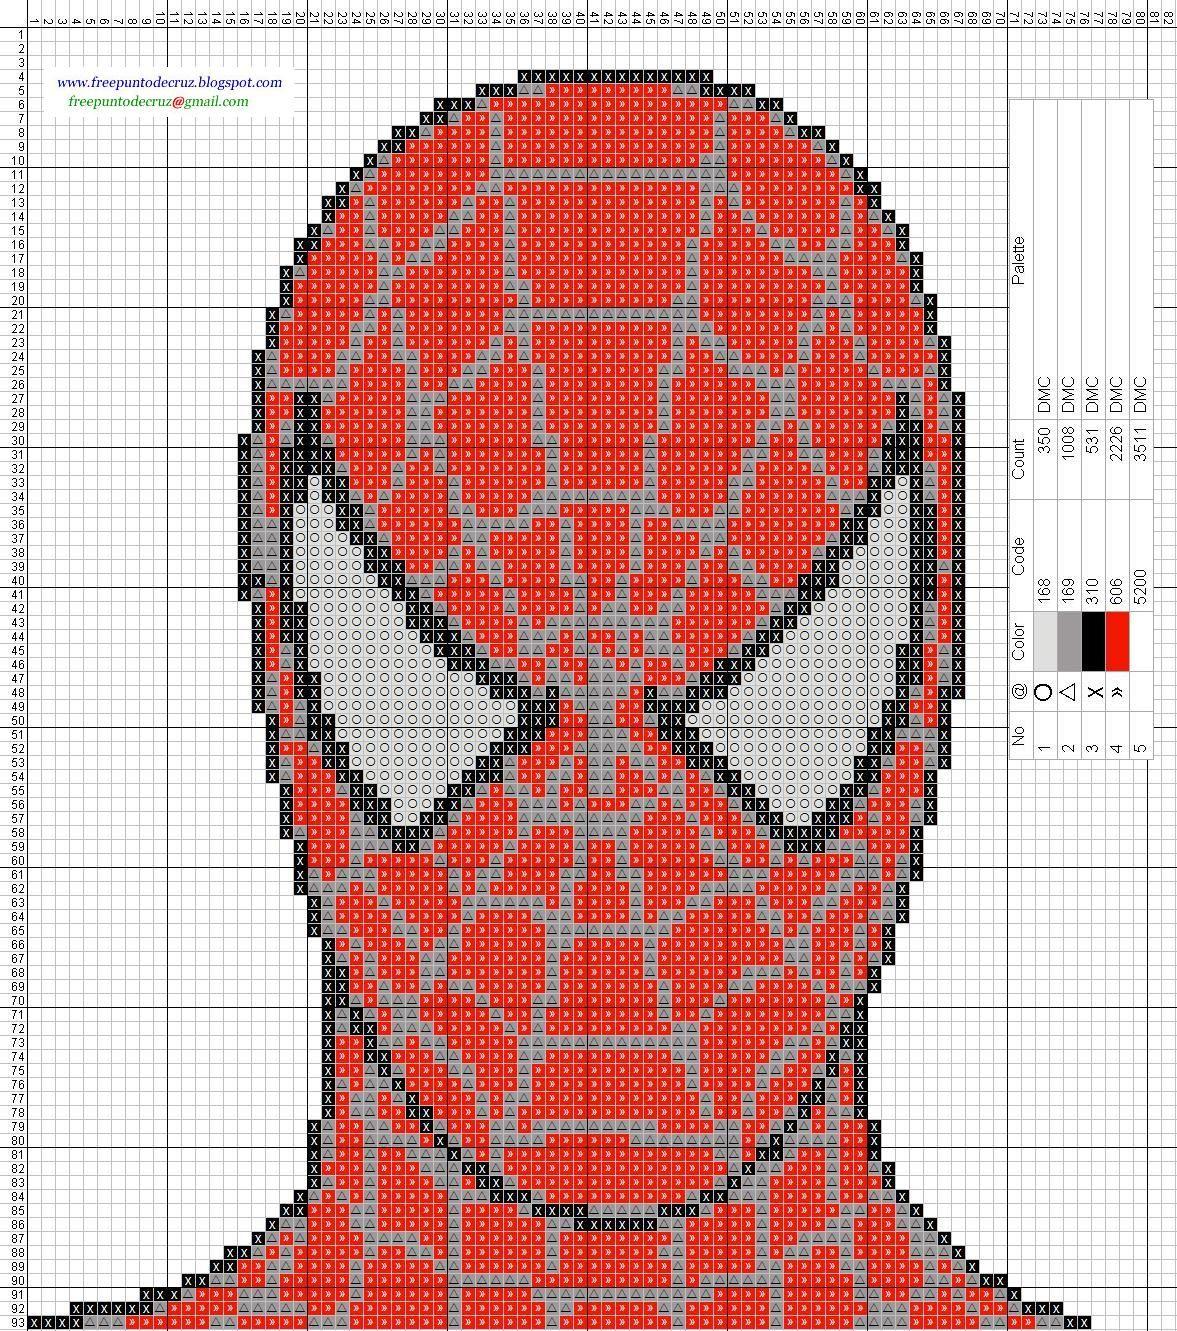 Spiderman point de croix cross stitch - Visit to grab an amazing super hero shirt now on sale ...